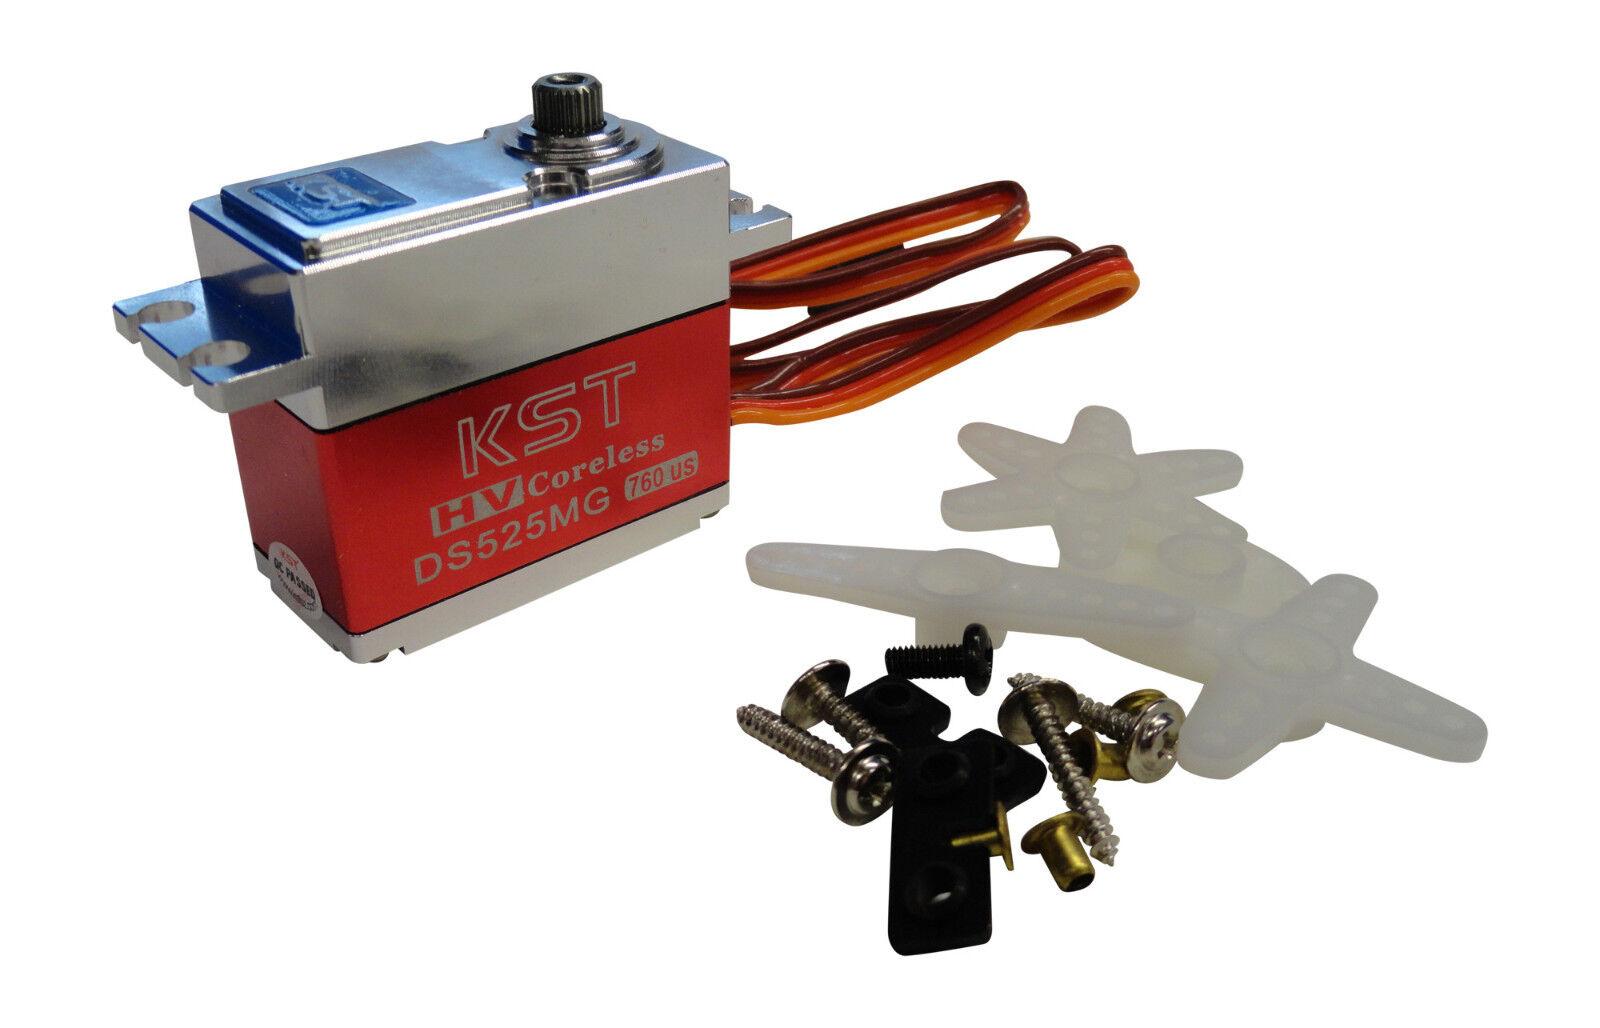 Kst DS525MG Estándar Hv Caja Metal Metal Gear Digital sin Núcleo Servo